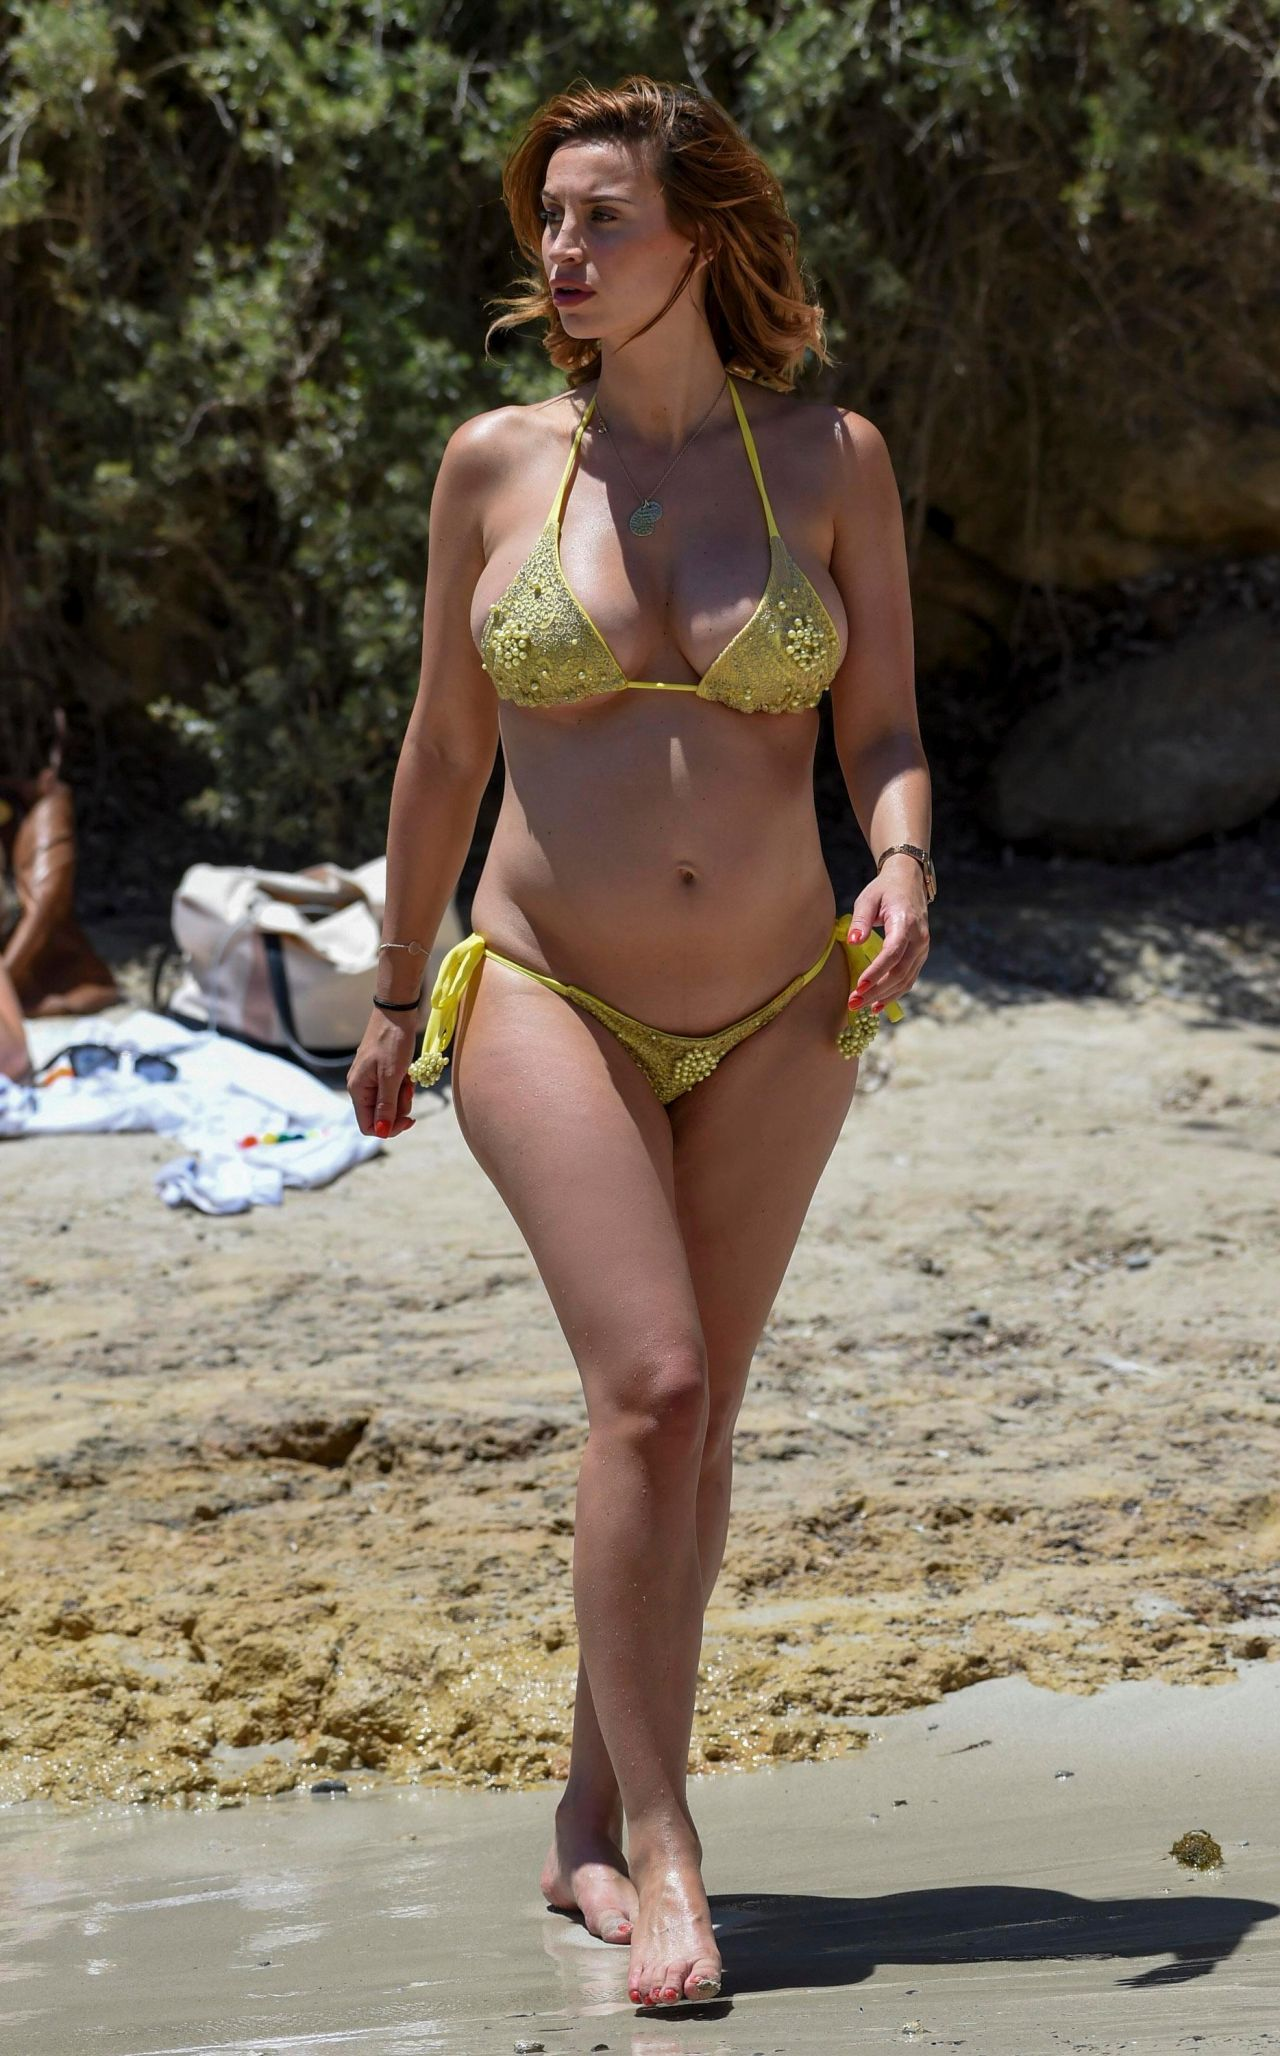 ferne-mccann-in-yellow-bikini-on-beach-in-majorca-spain-07-07-2017-8.jpg (1280×2056)